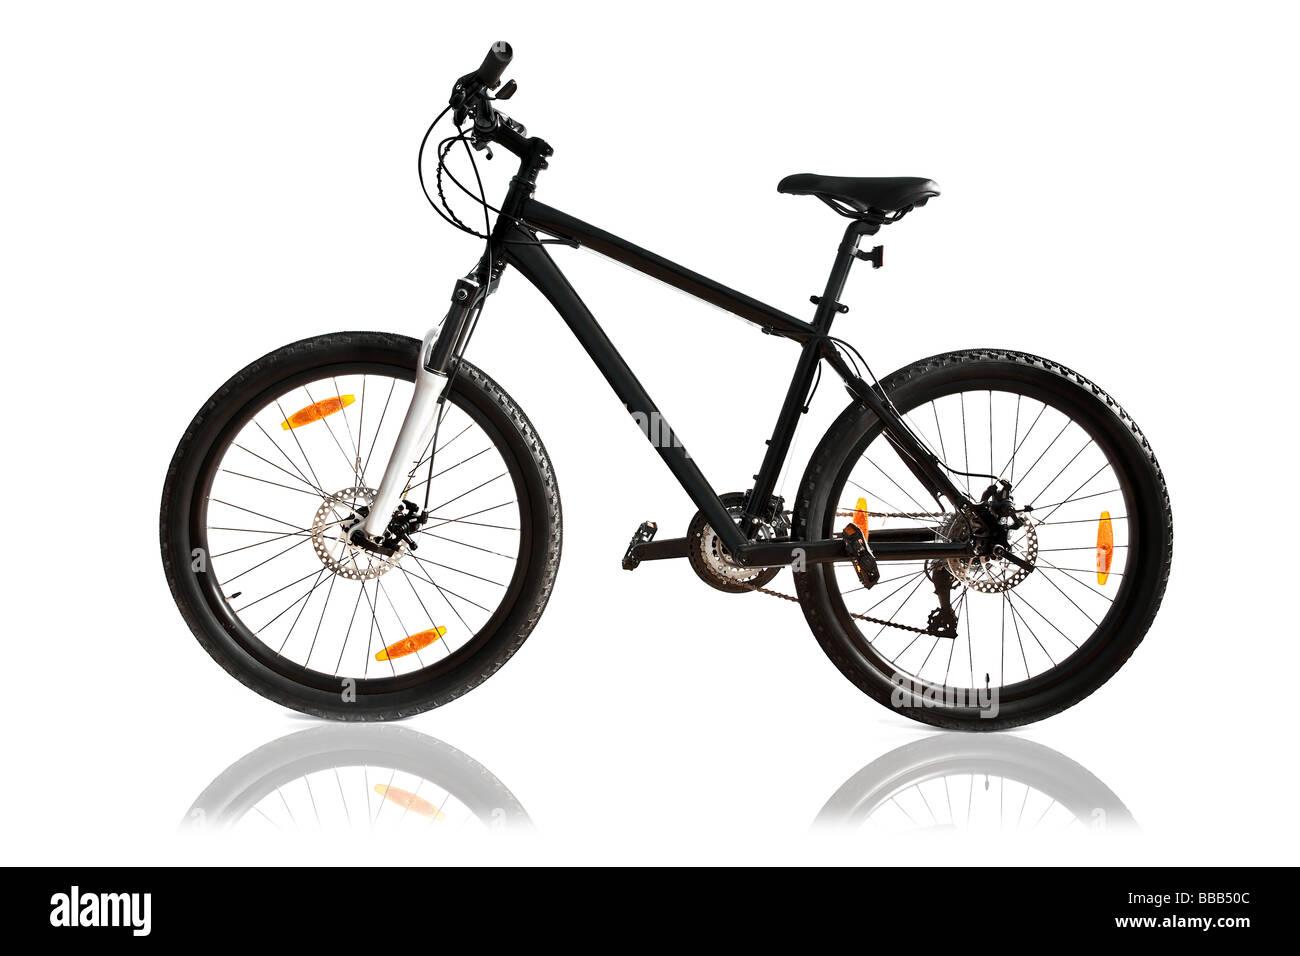 Negro aislado de bicicletas Imagen De Stock